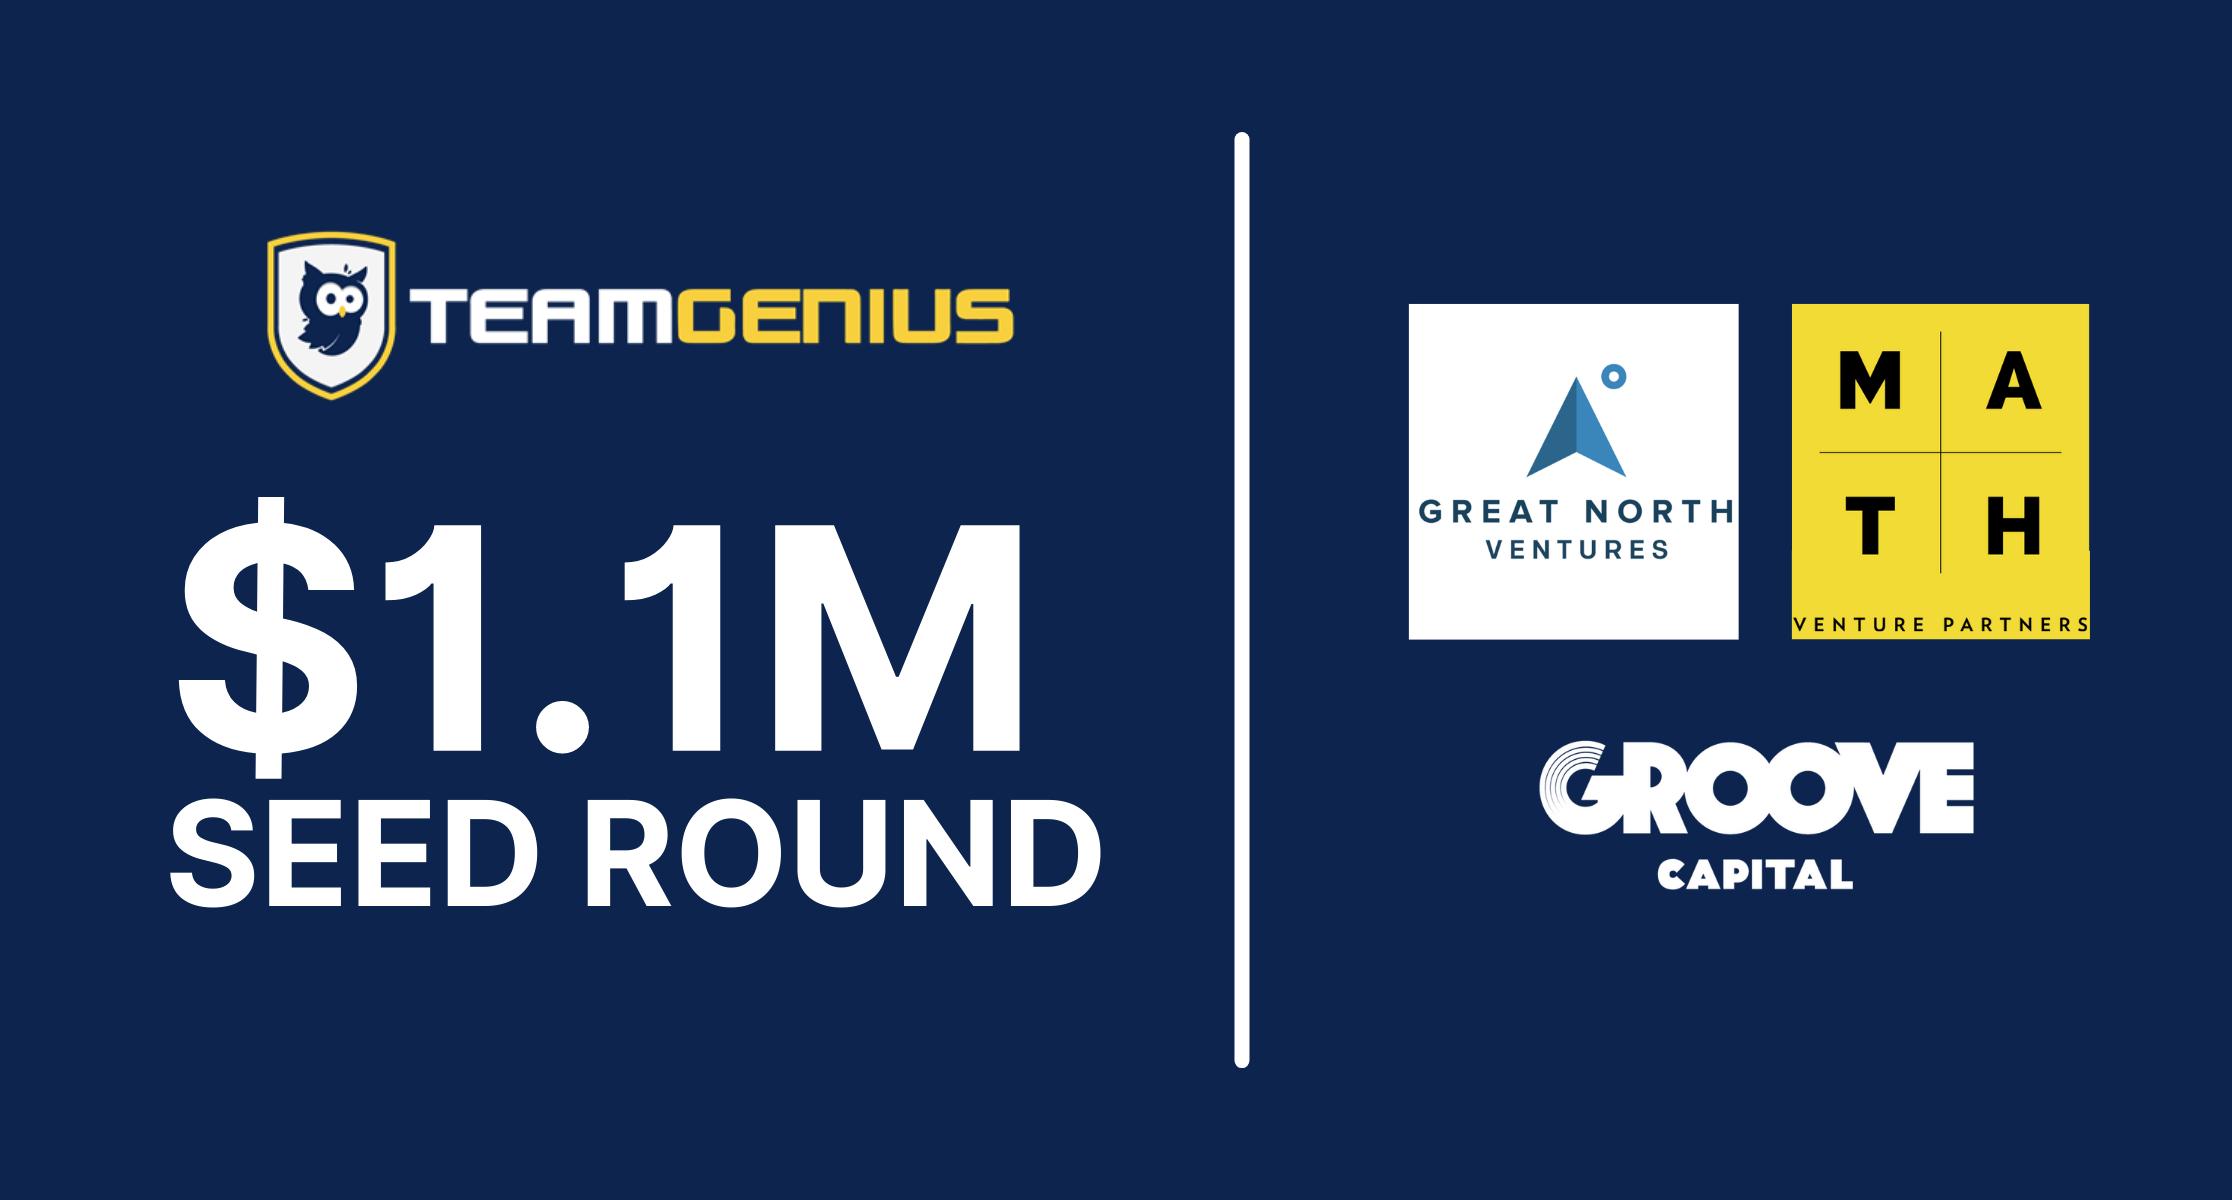 TeamGenius Seed Round Press Release